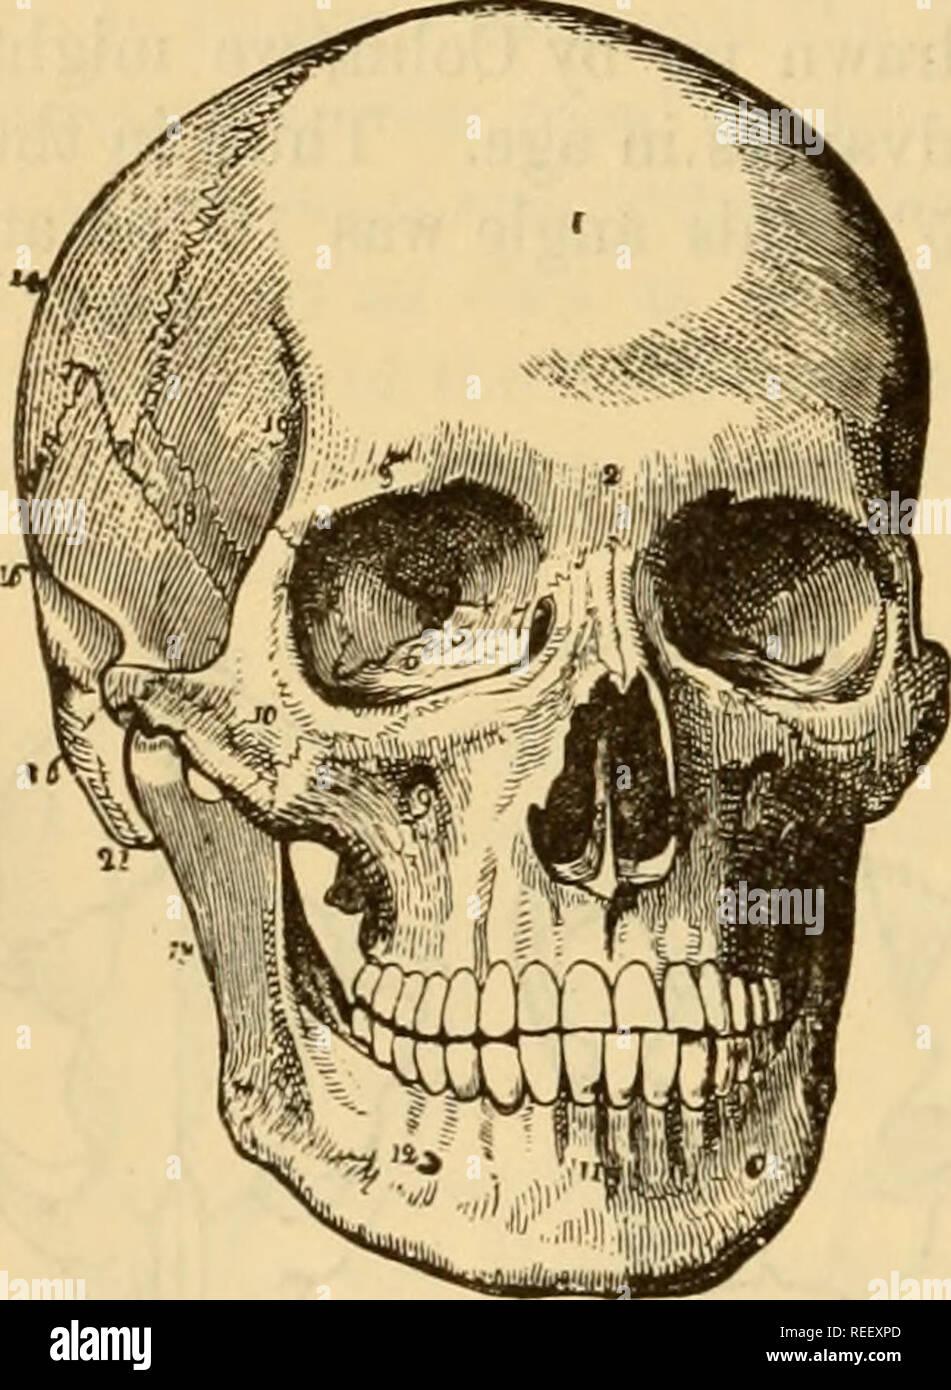 GroГџer Muschus-Knochen